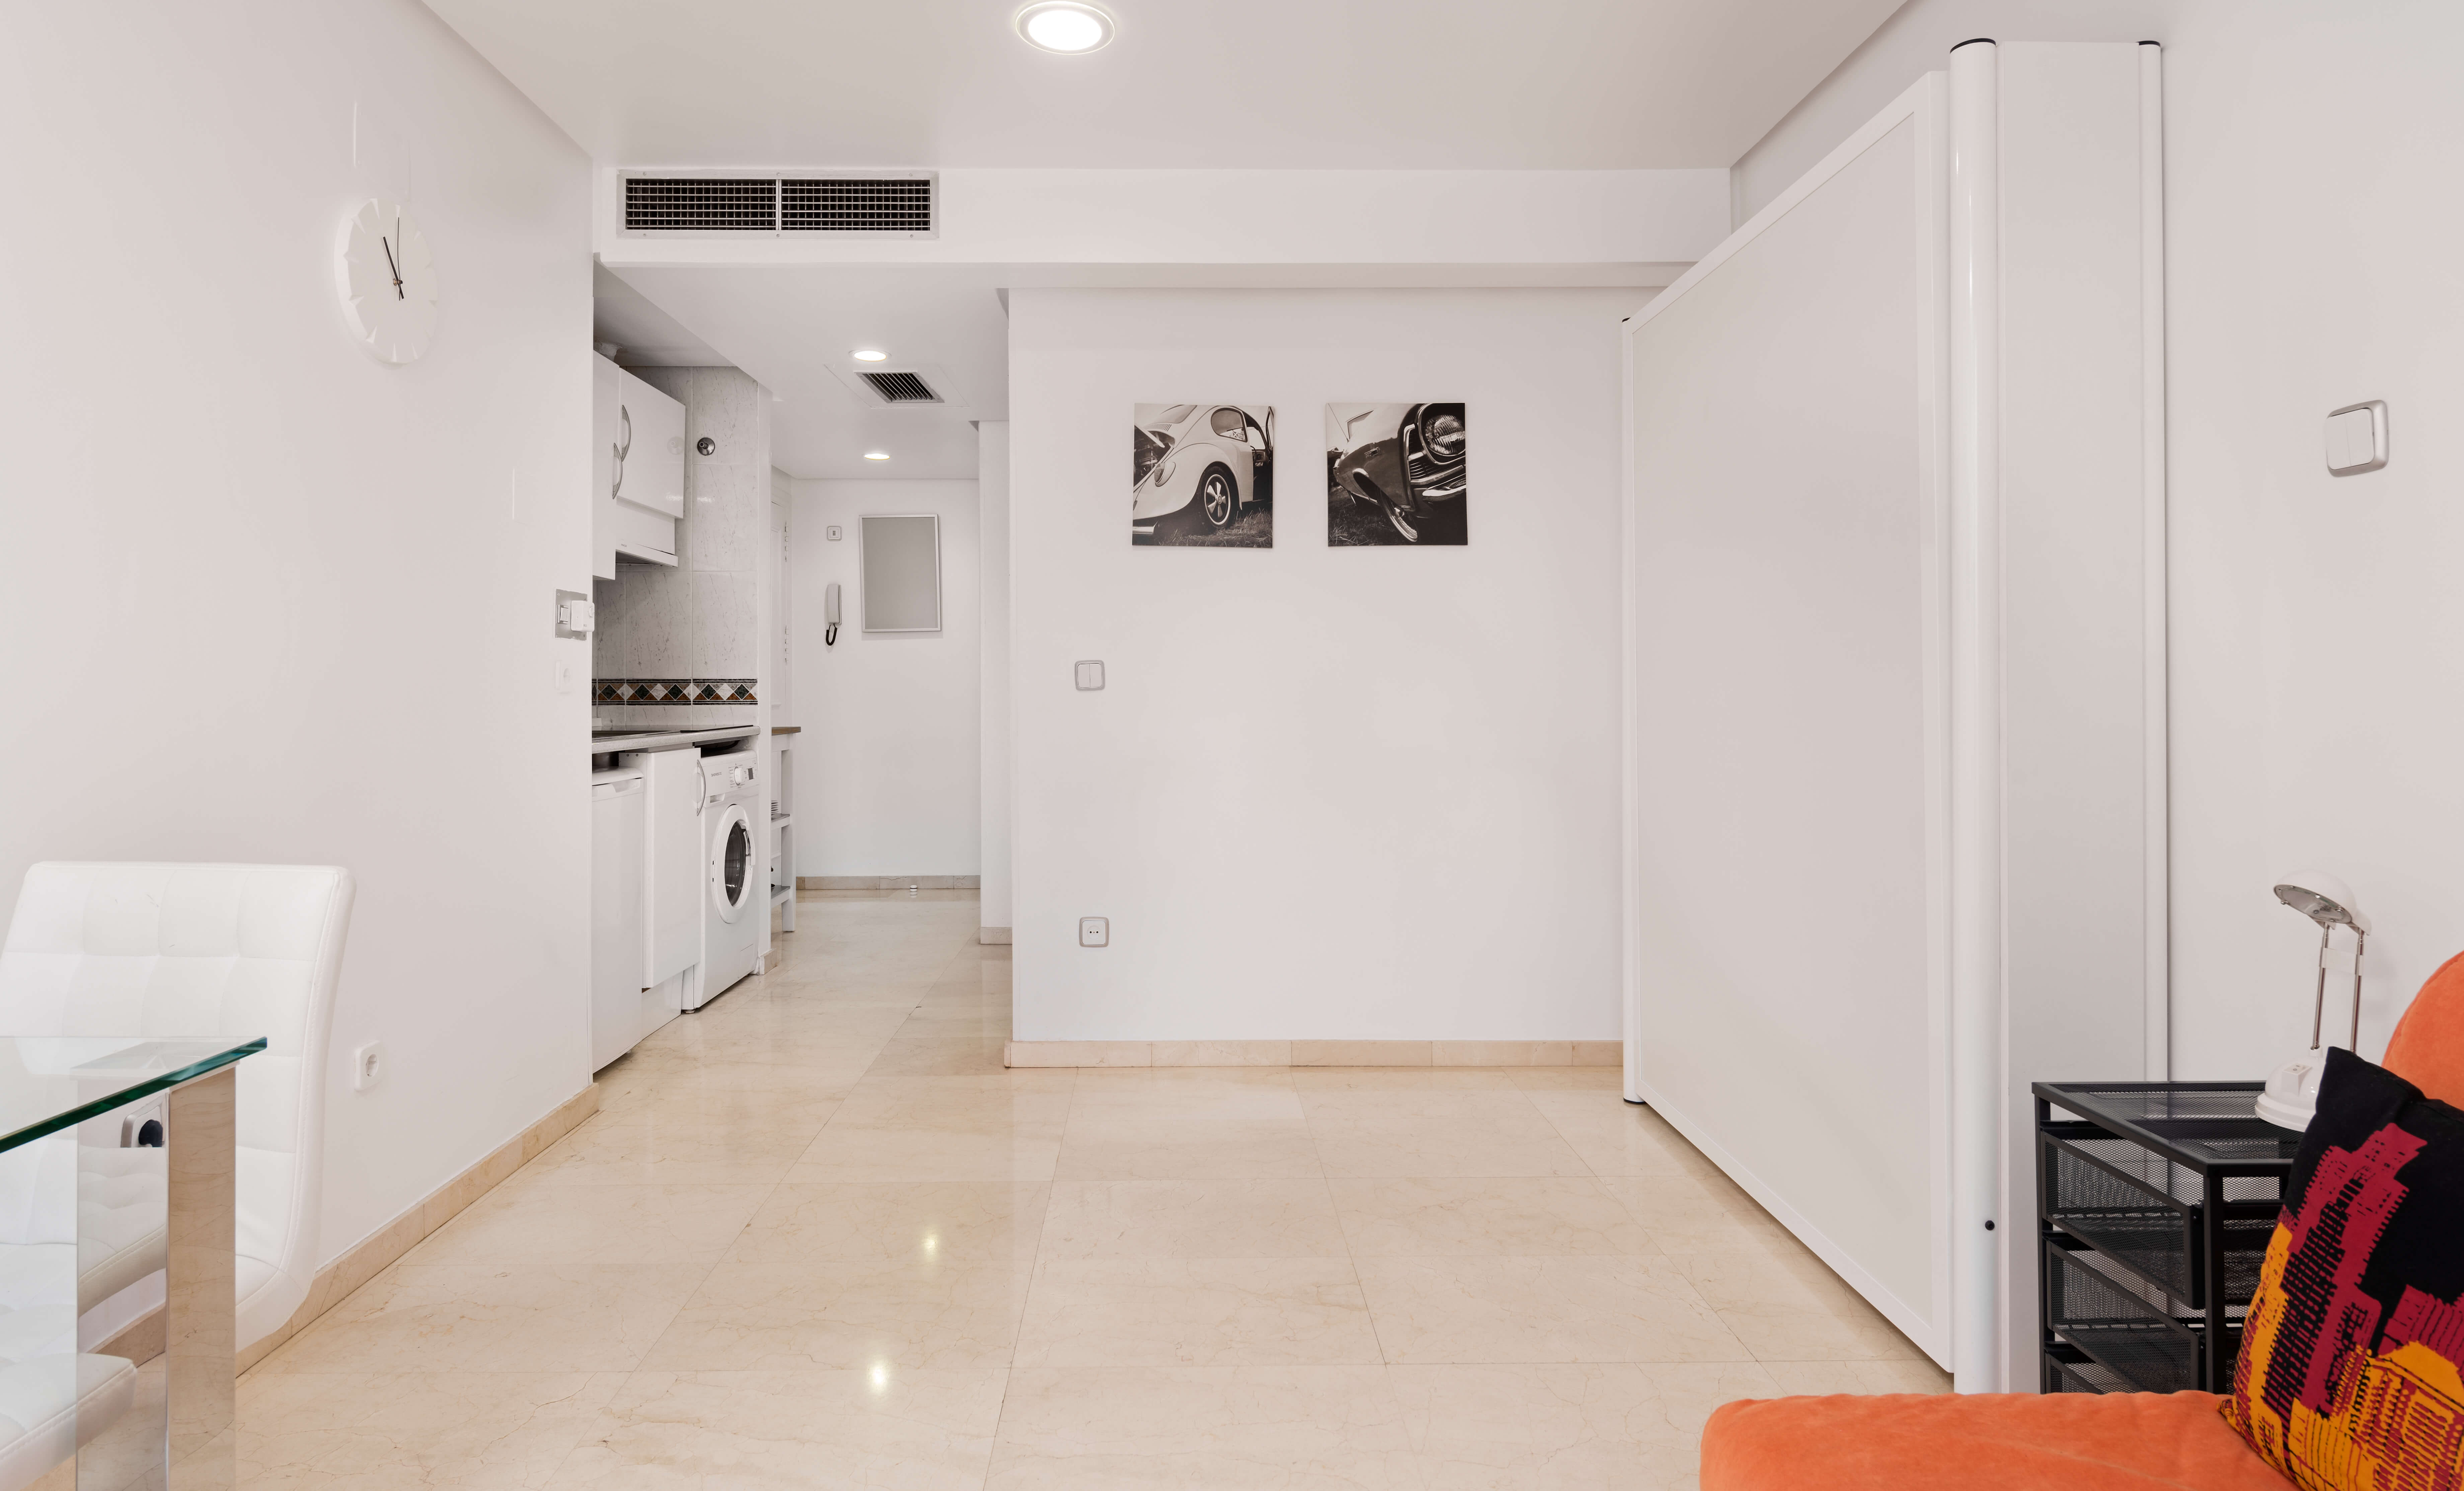 pisos en alquiler en Madrid centro